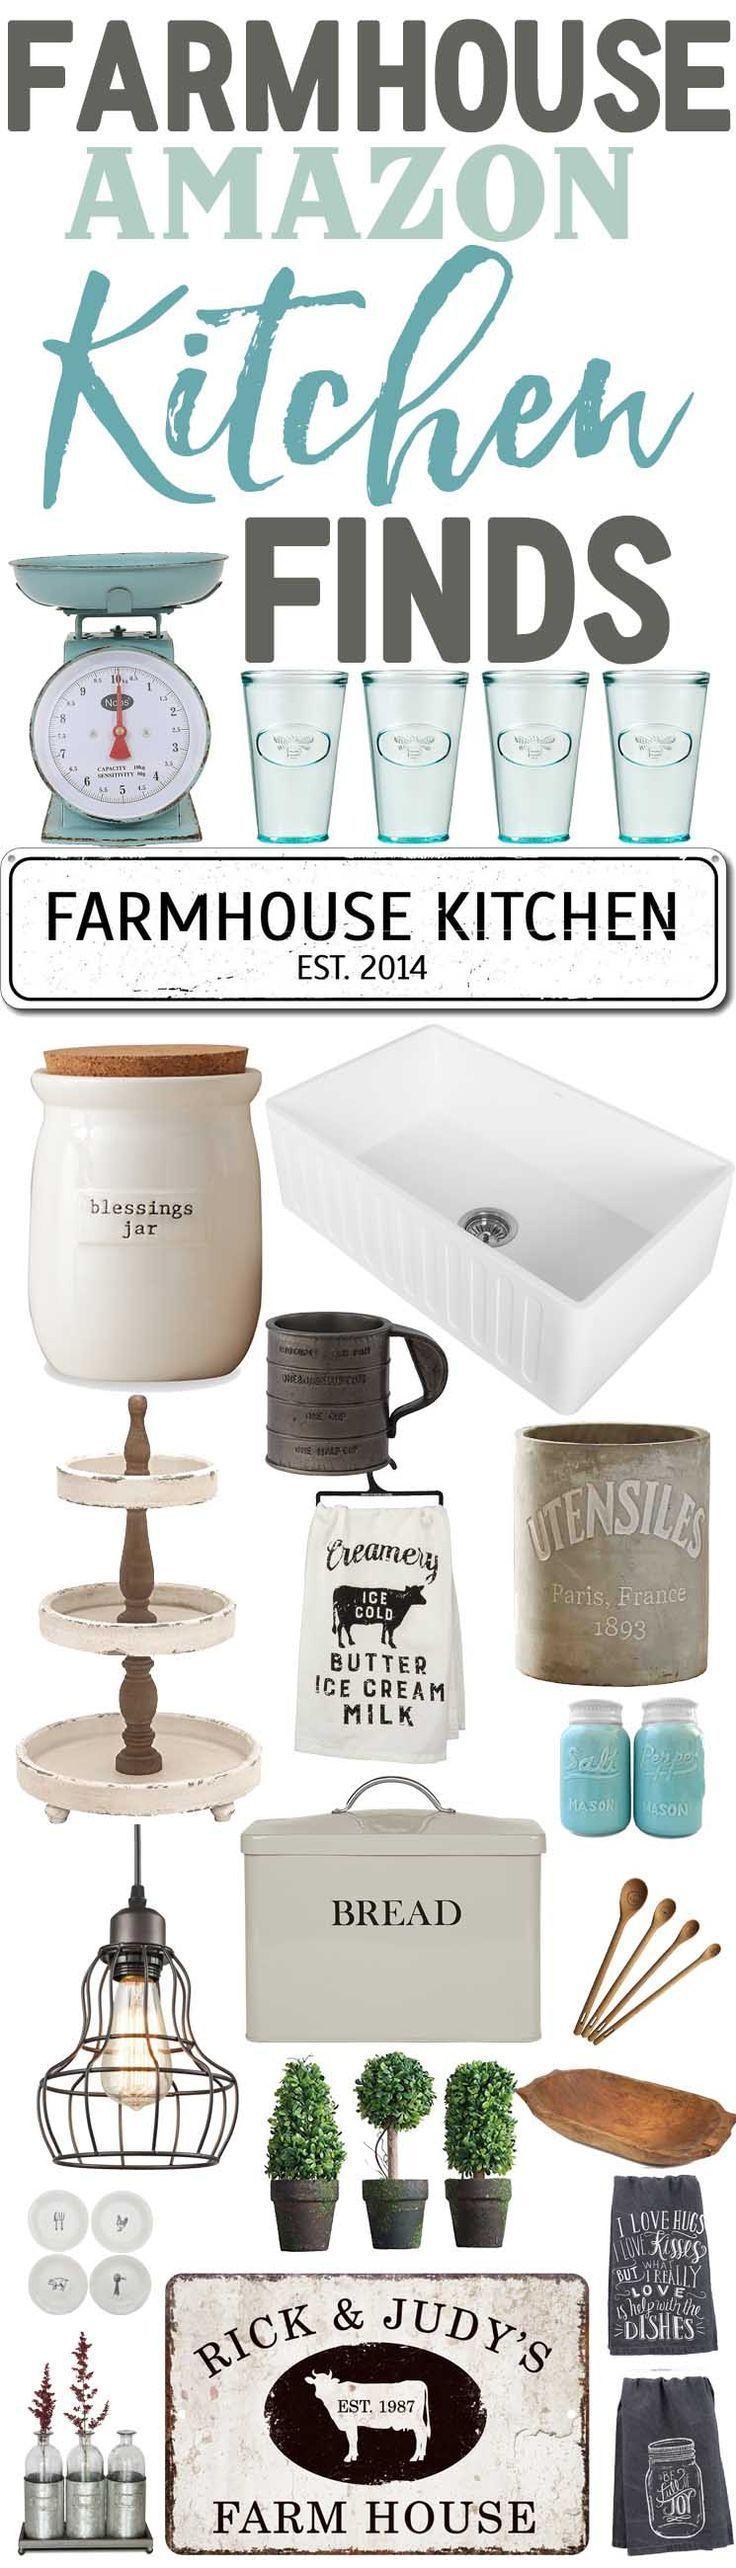 Farmhouse Kitchen Finds From Amazon-Affordable Farmhouse Kitchen Decor-www.themountainviewcottage.net.jpg